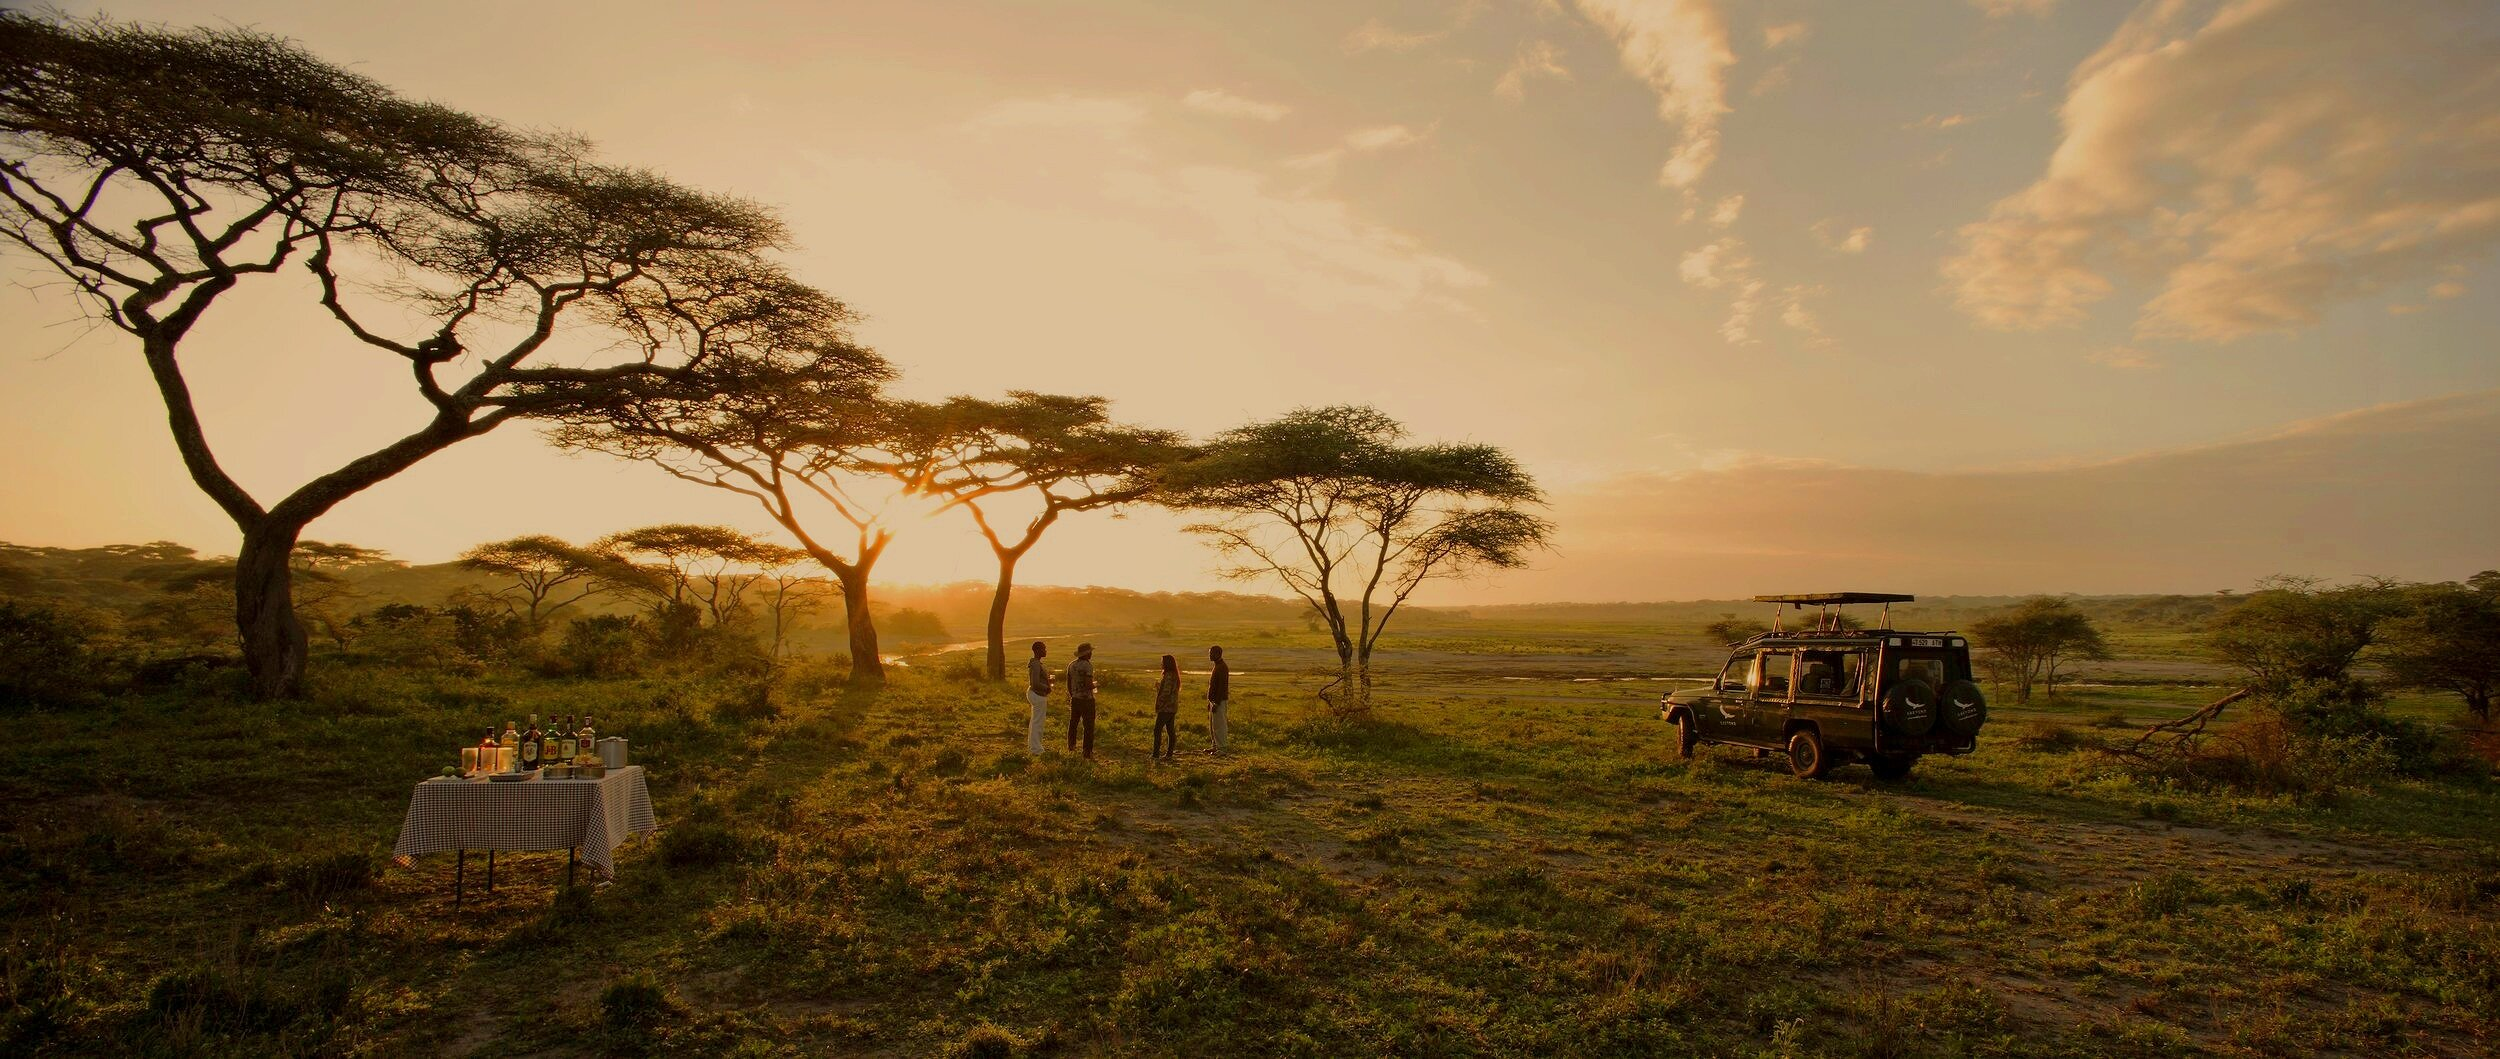 and beyond - serengeti under canvas